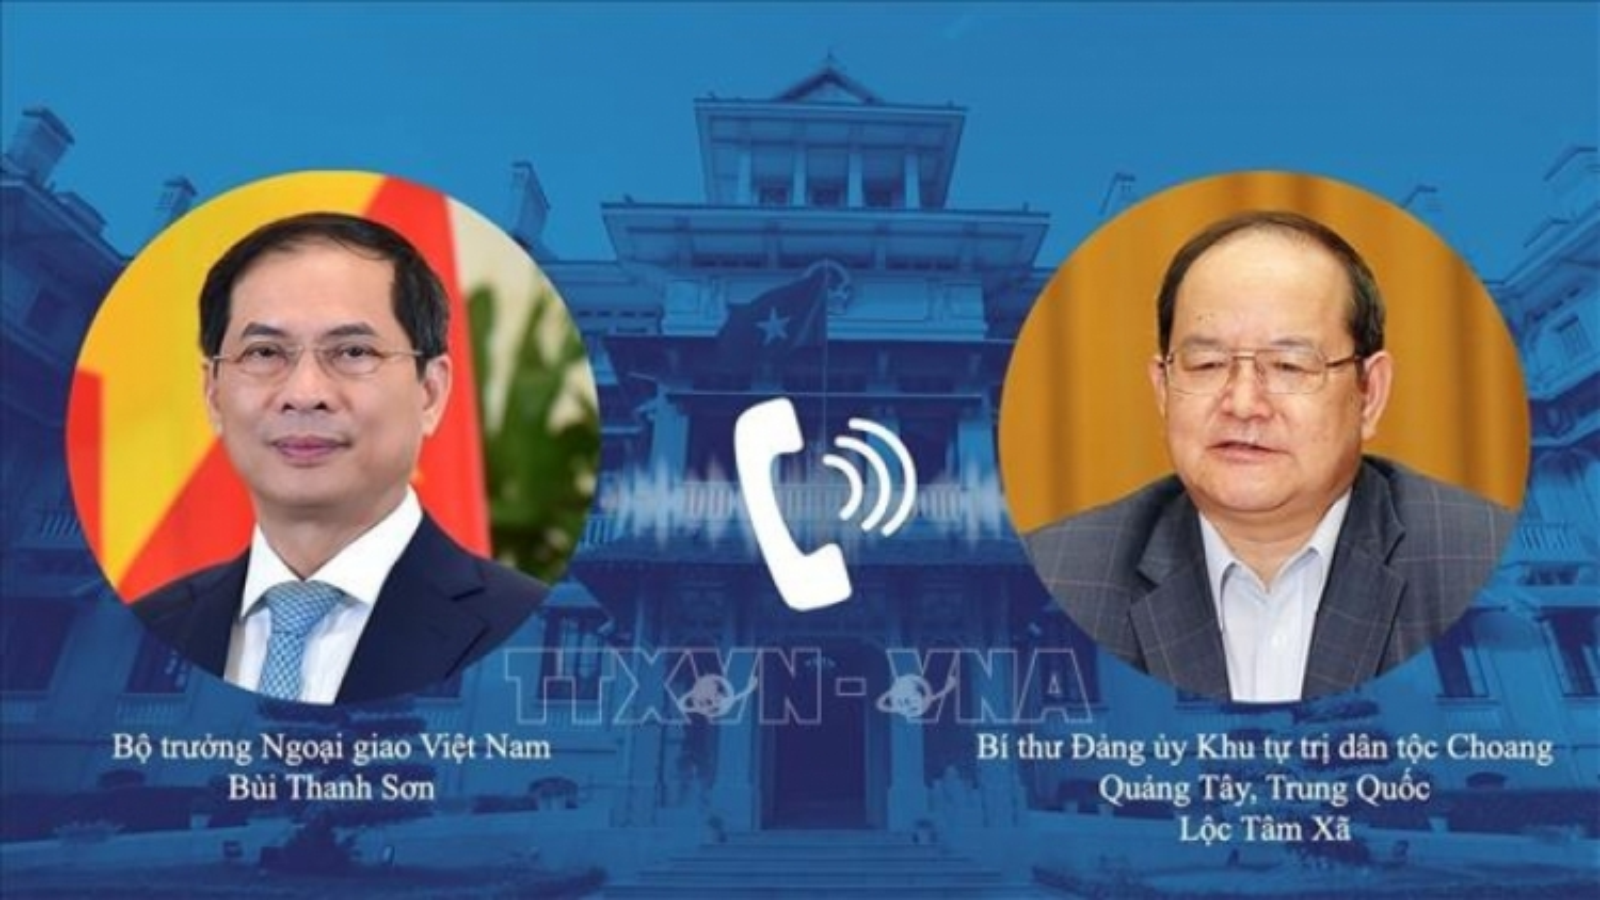 Vietnam treasures comprehensive strategic partnership with China